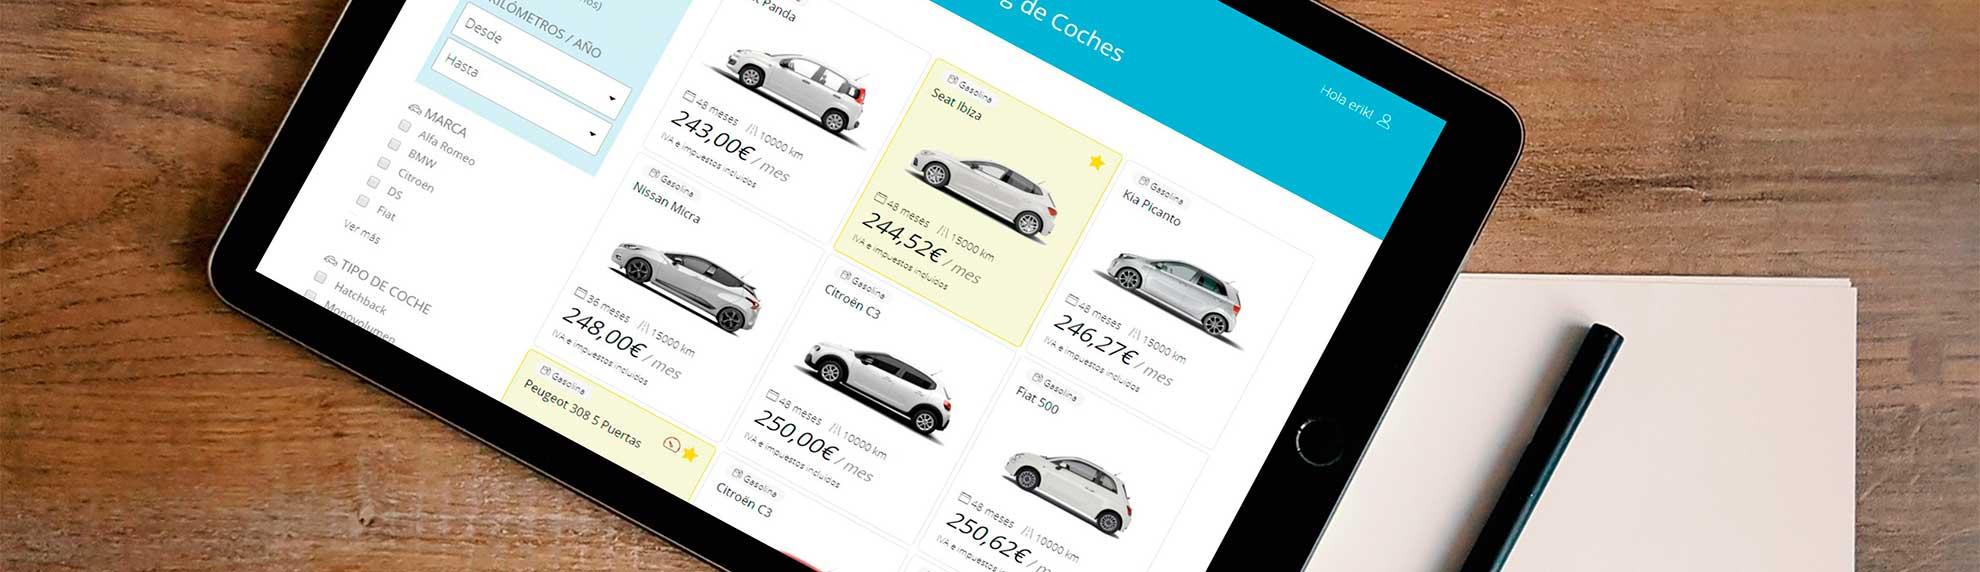 Listado de ofertas de renting de coche